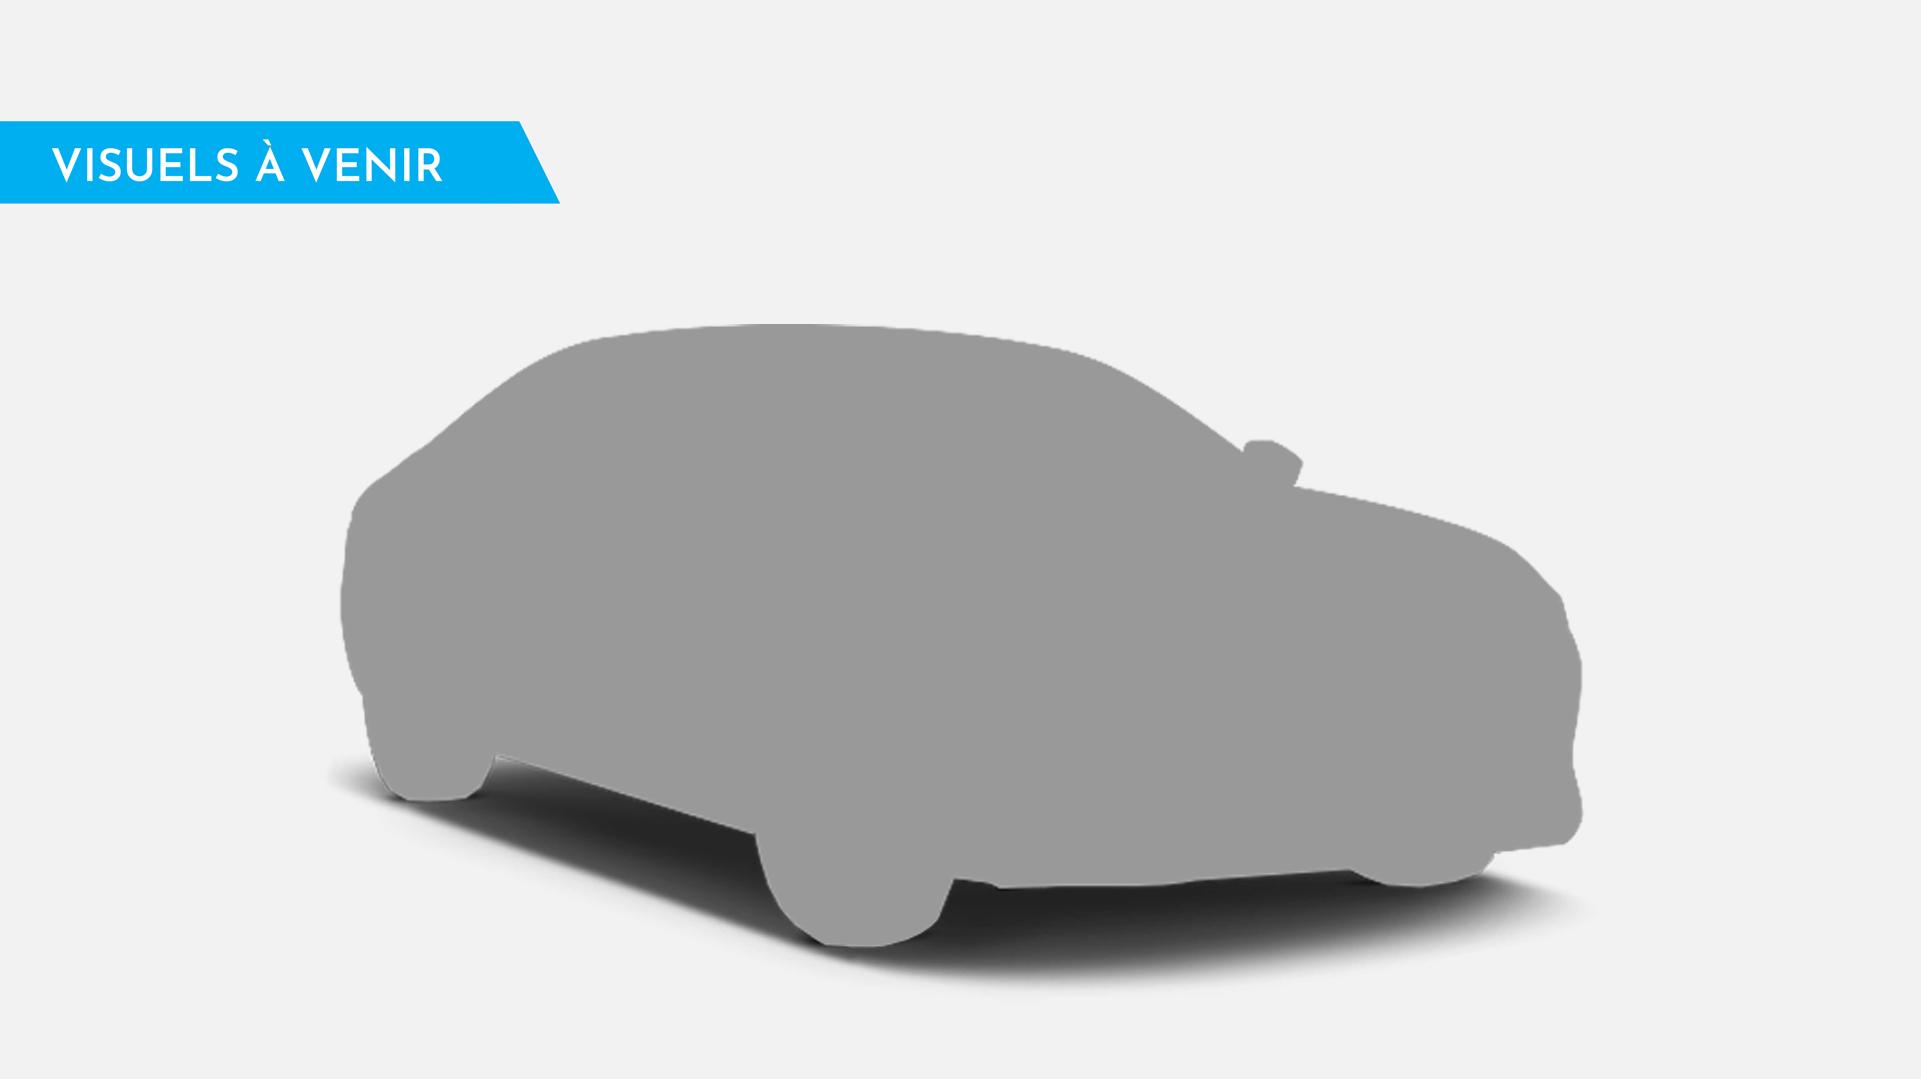 volkswagen tiguan 2 0 tdi 190ch carat exclusive 4motion dsg7 occasion lyon s r zin rh ne ora7. Black Bedroom Furniture Sets. Home Design Ideas